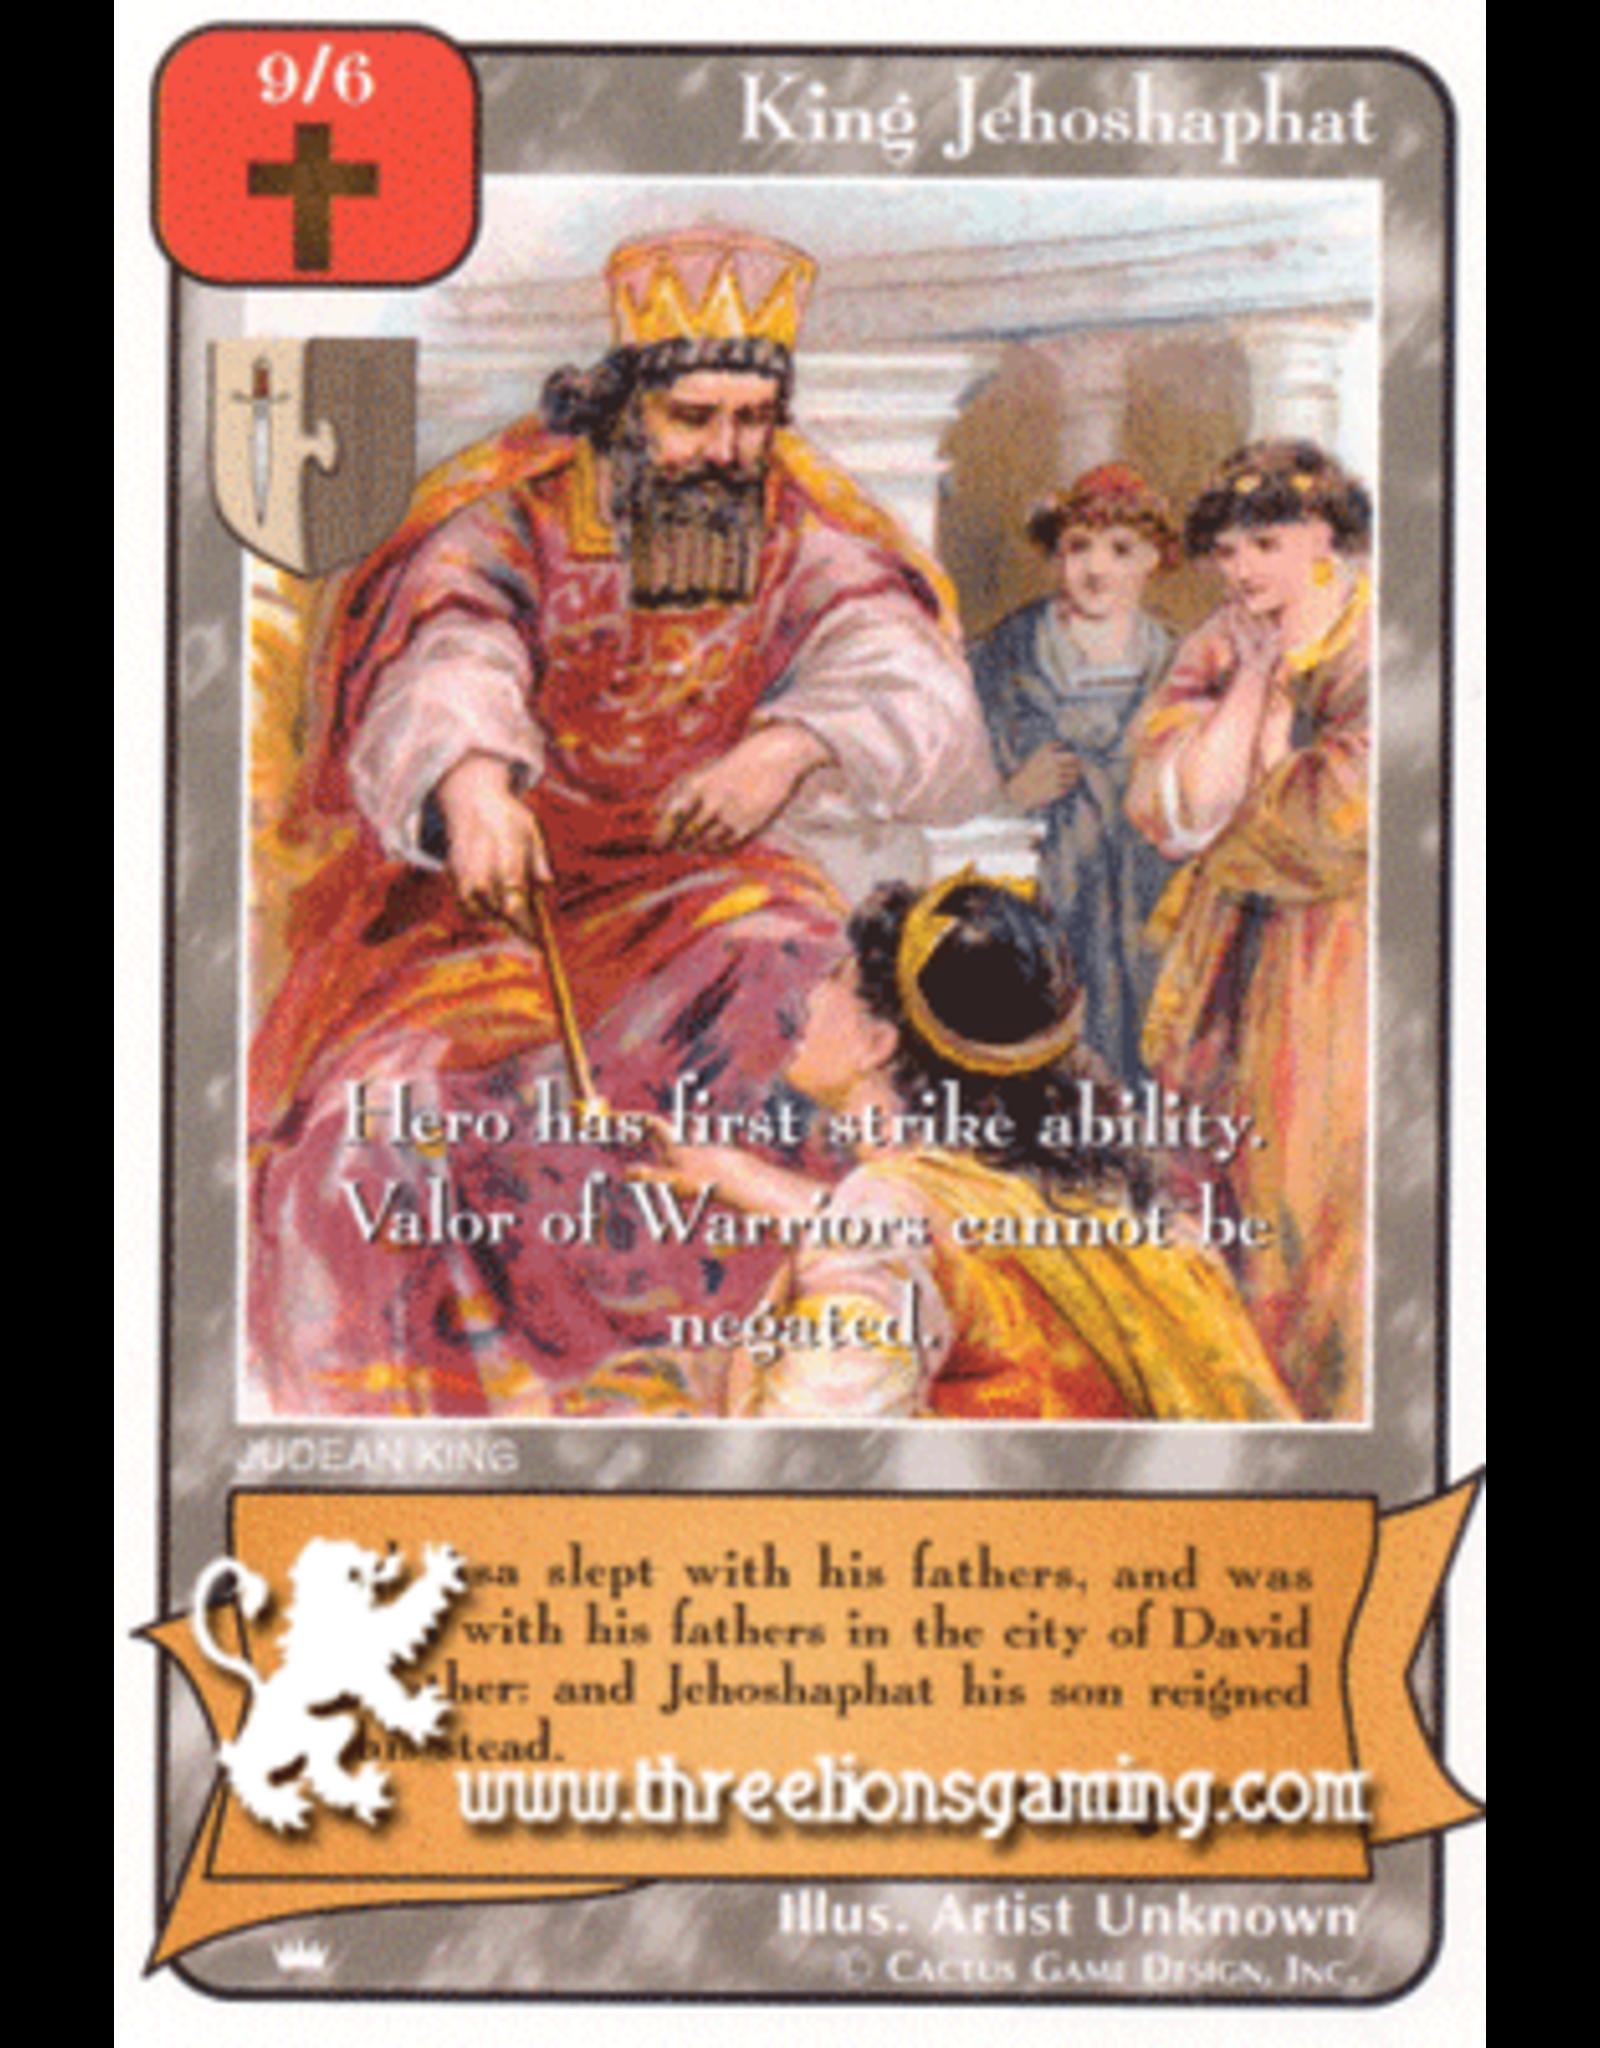 Ki: King Jehoshaphat